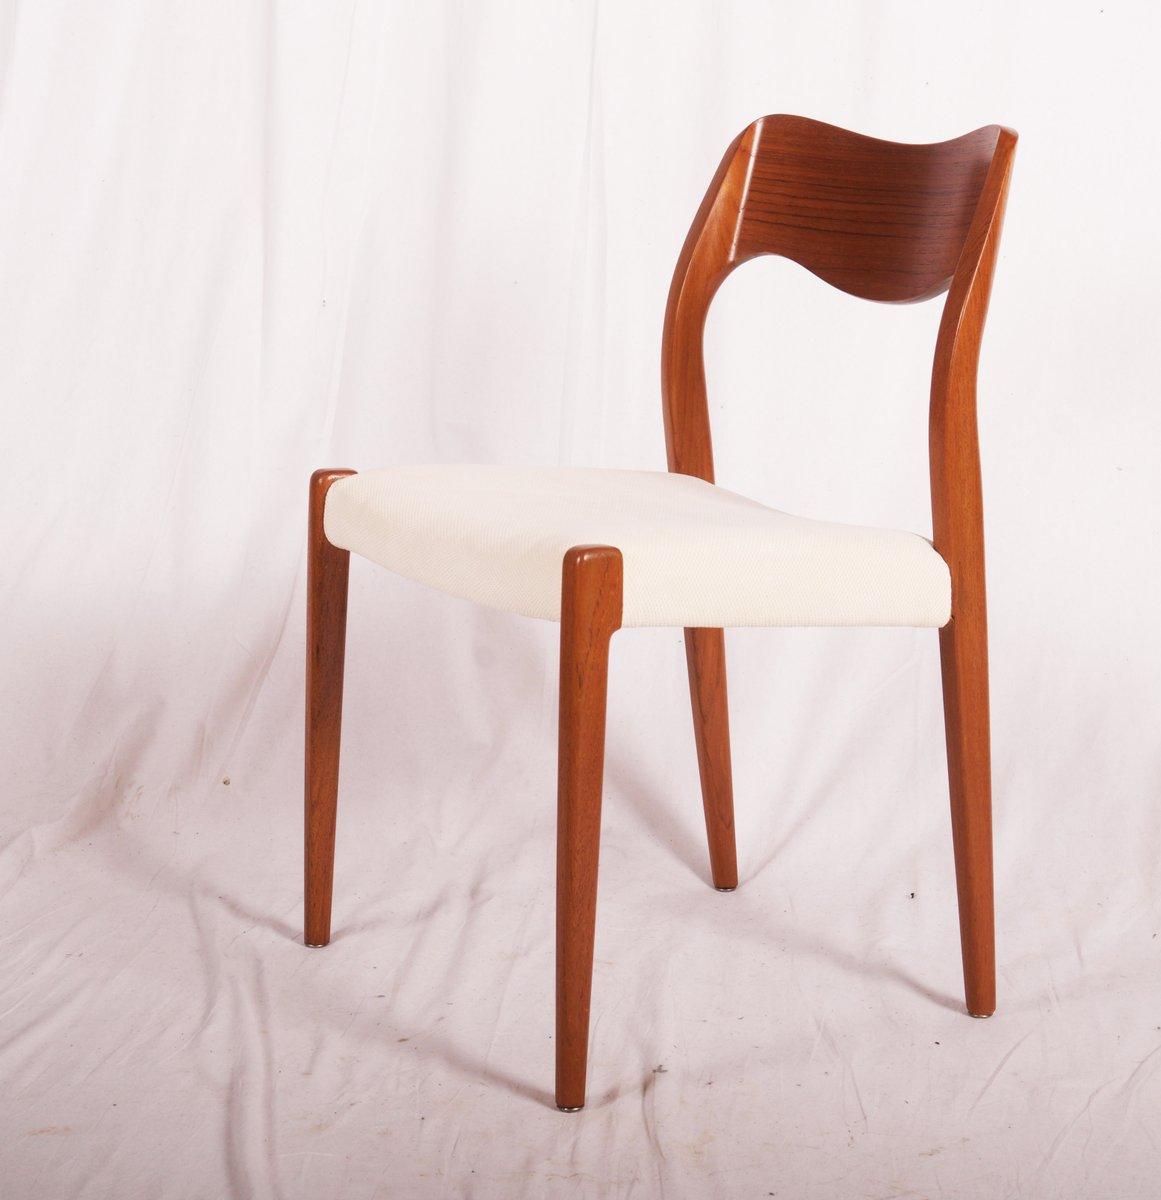 model 71 teak dining chairs by niels otto m ller for j l. Black Bedroom Furniture Sets. Home Design Ideas